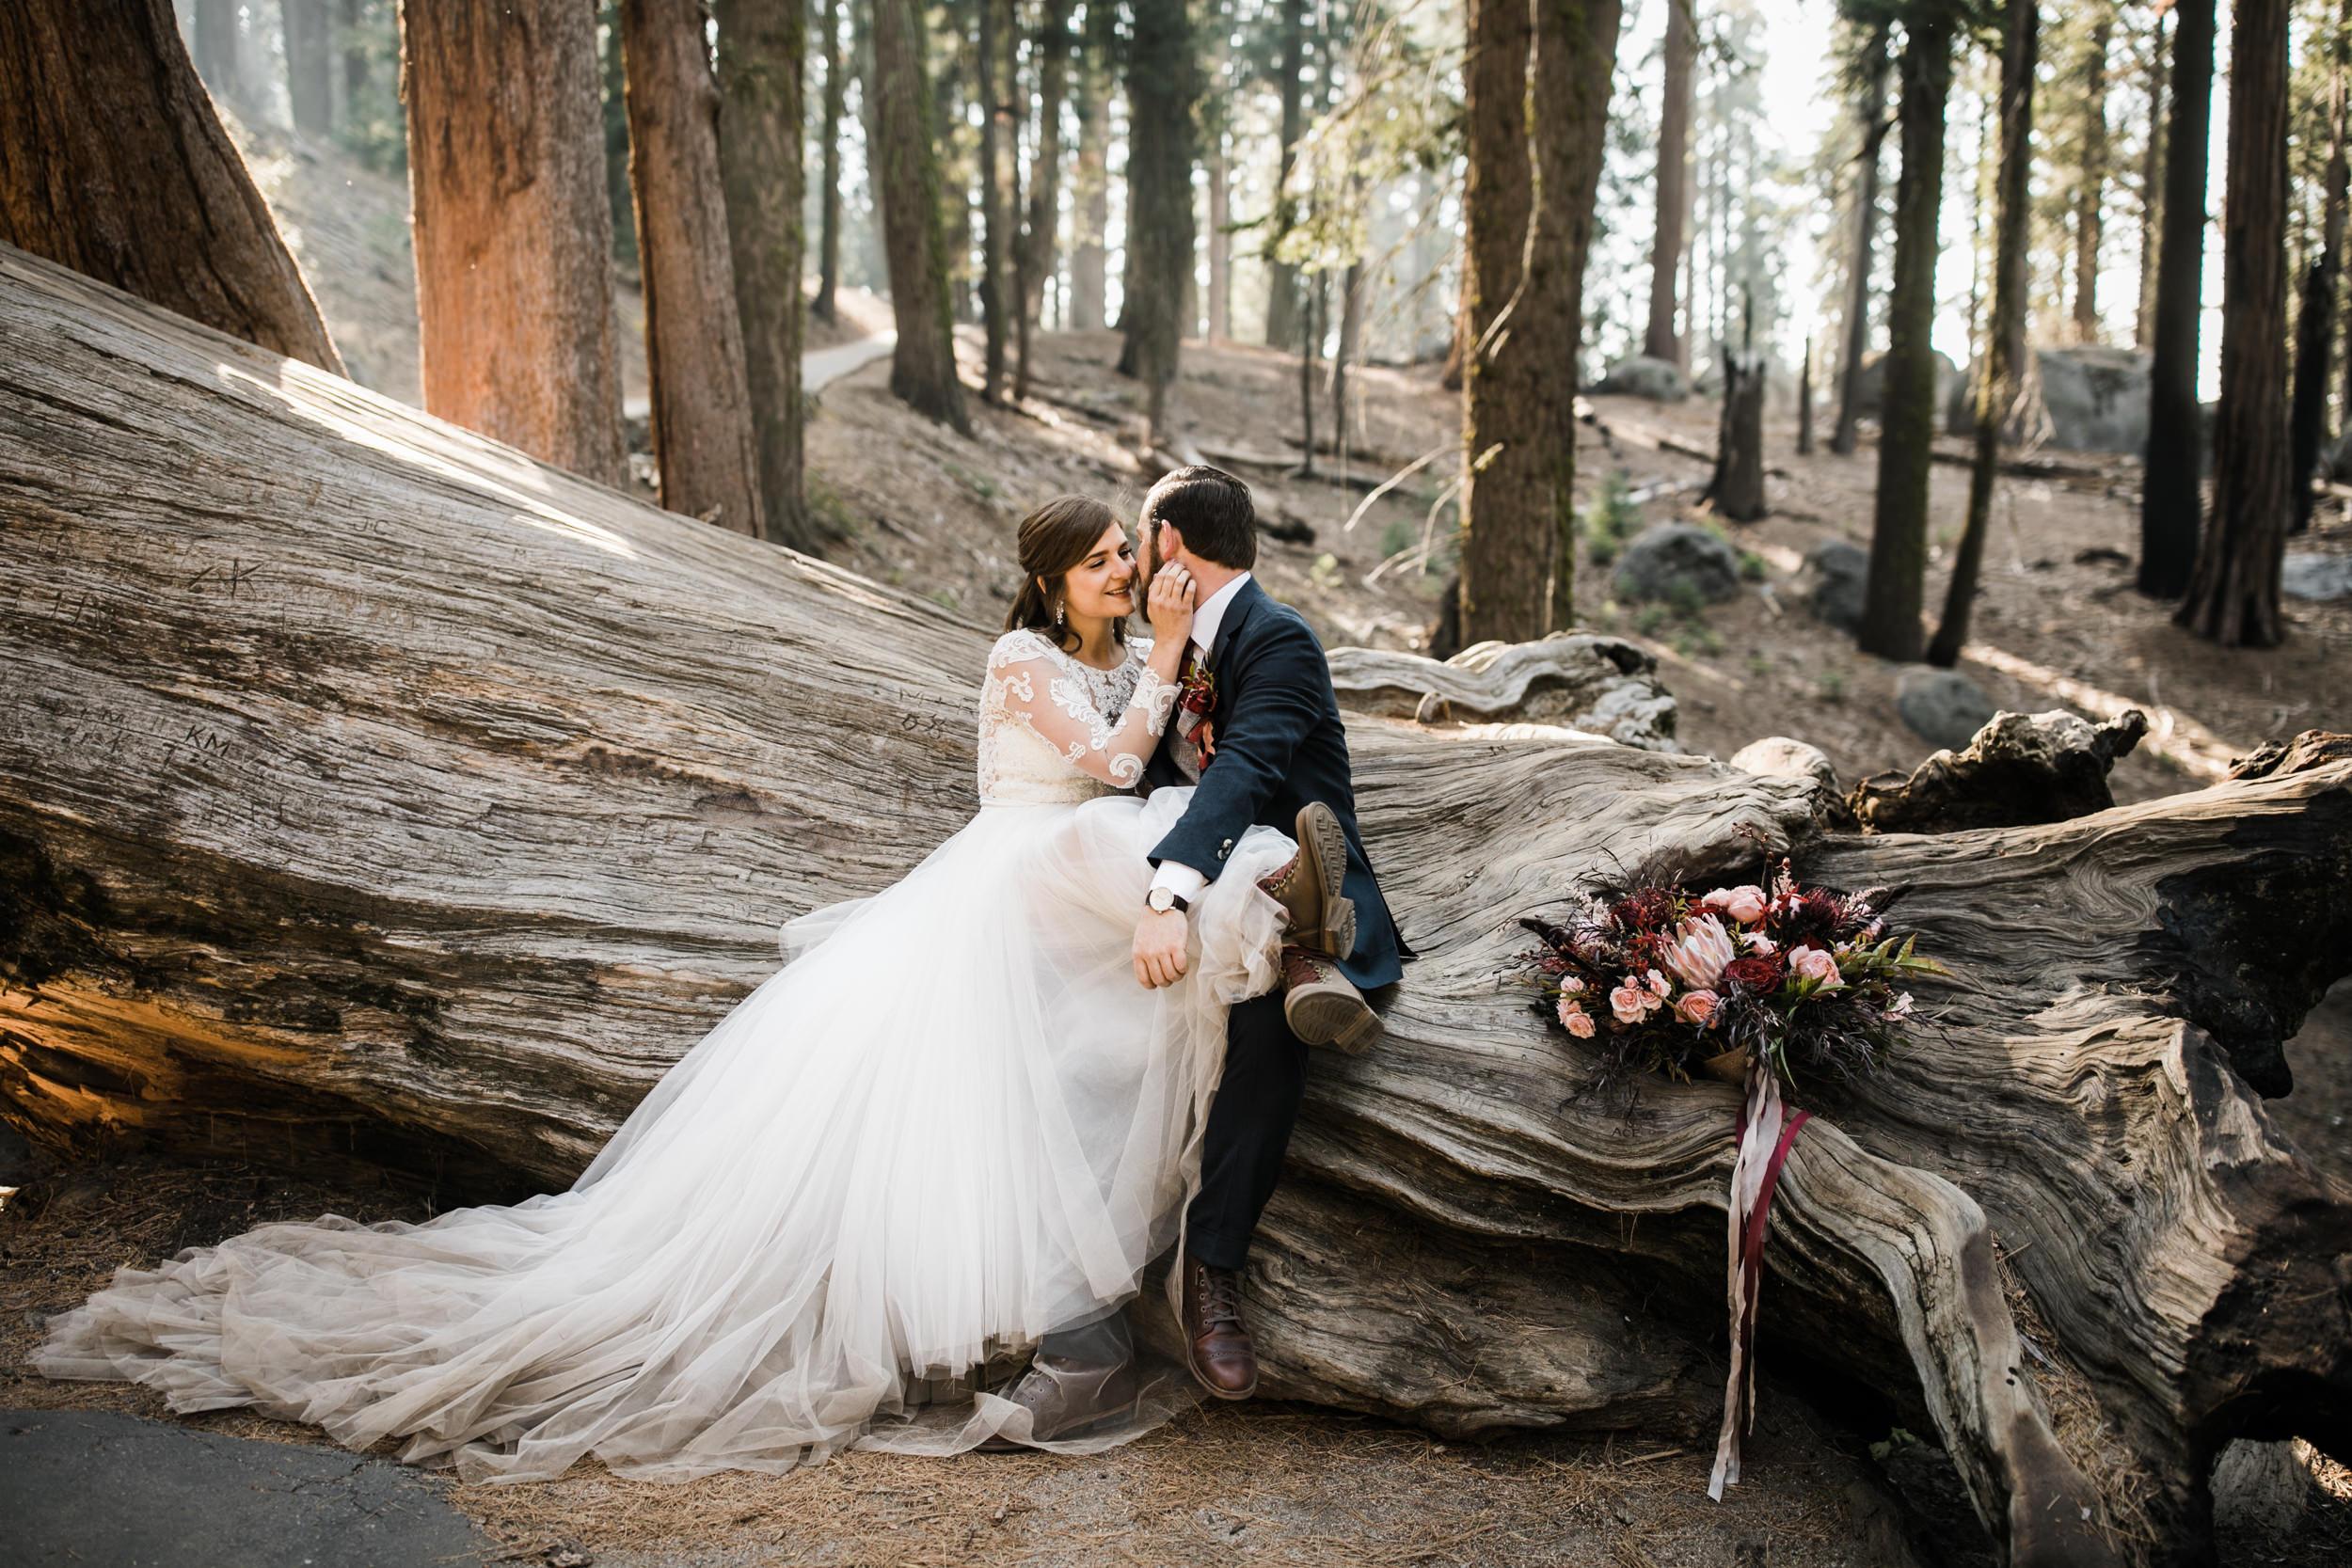 elopement wedding in sequoia national park | adventure weddings in california | the hearnes adventure photography